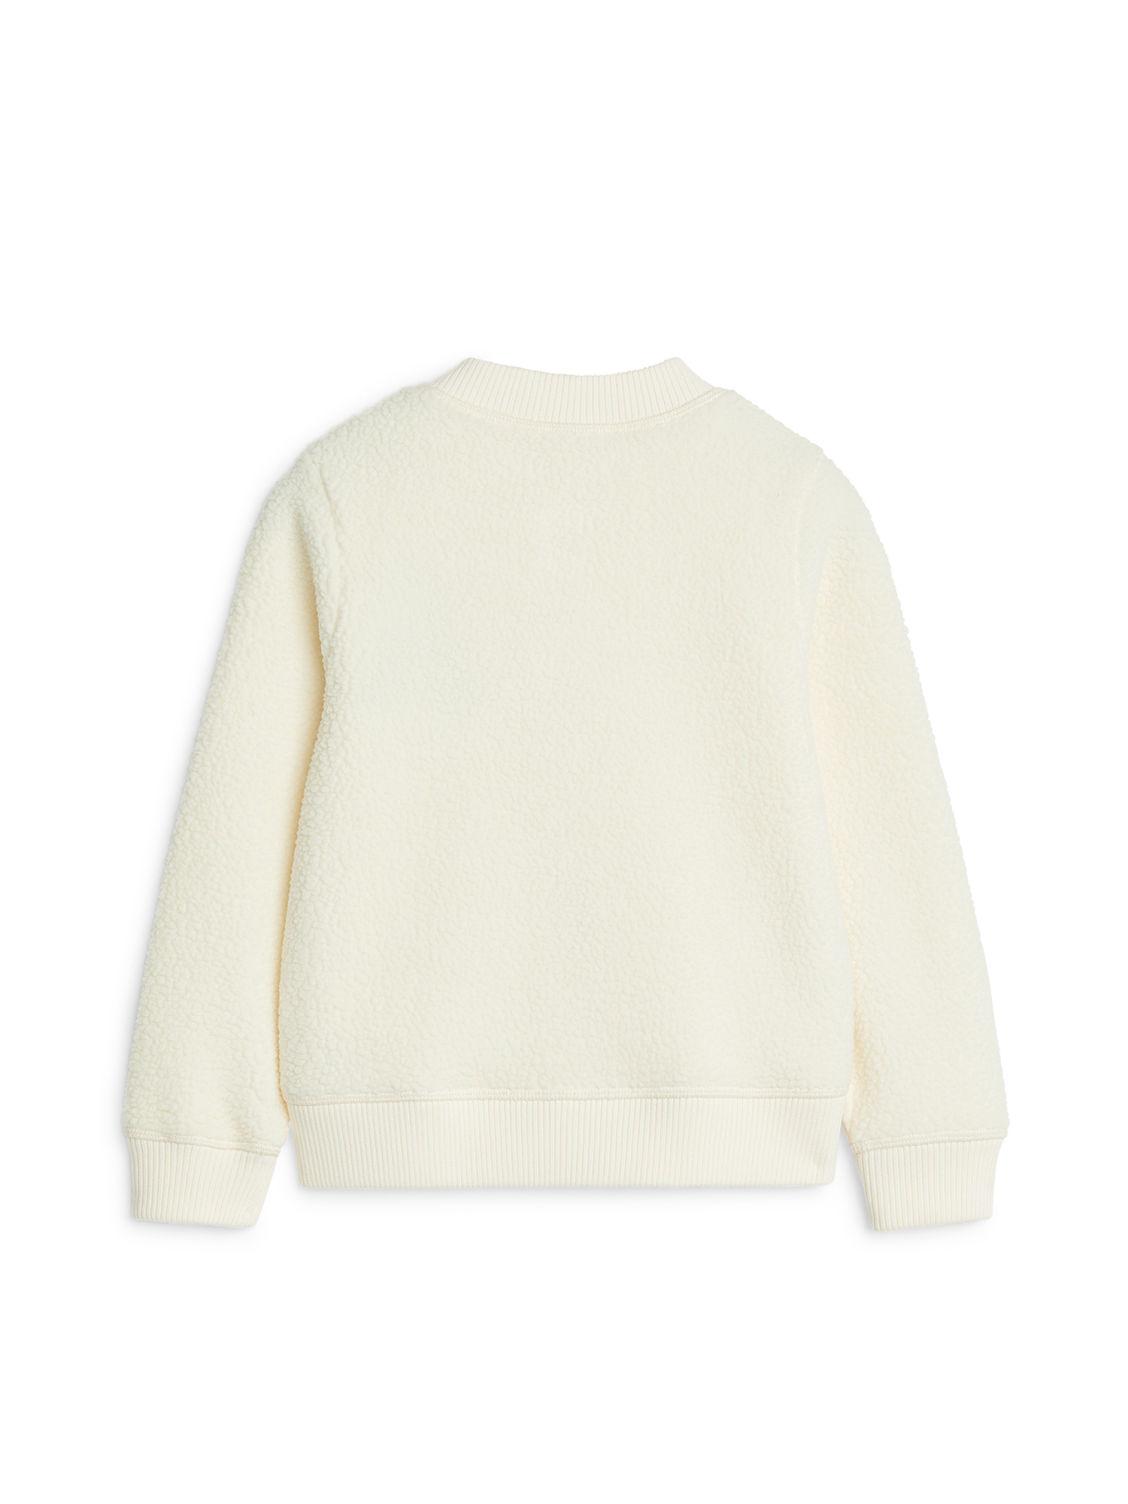 Pile Fleece Cardigan - Off White - Sweatshirts & Hoodies - ARKET